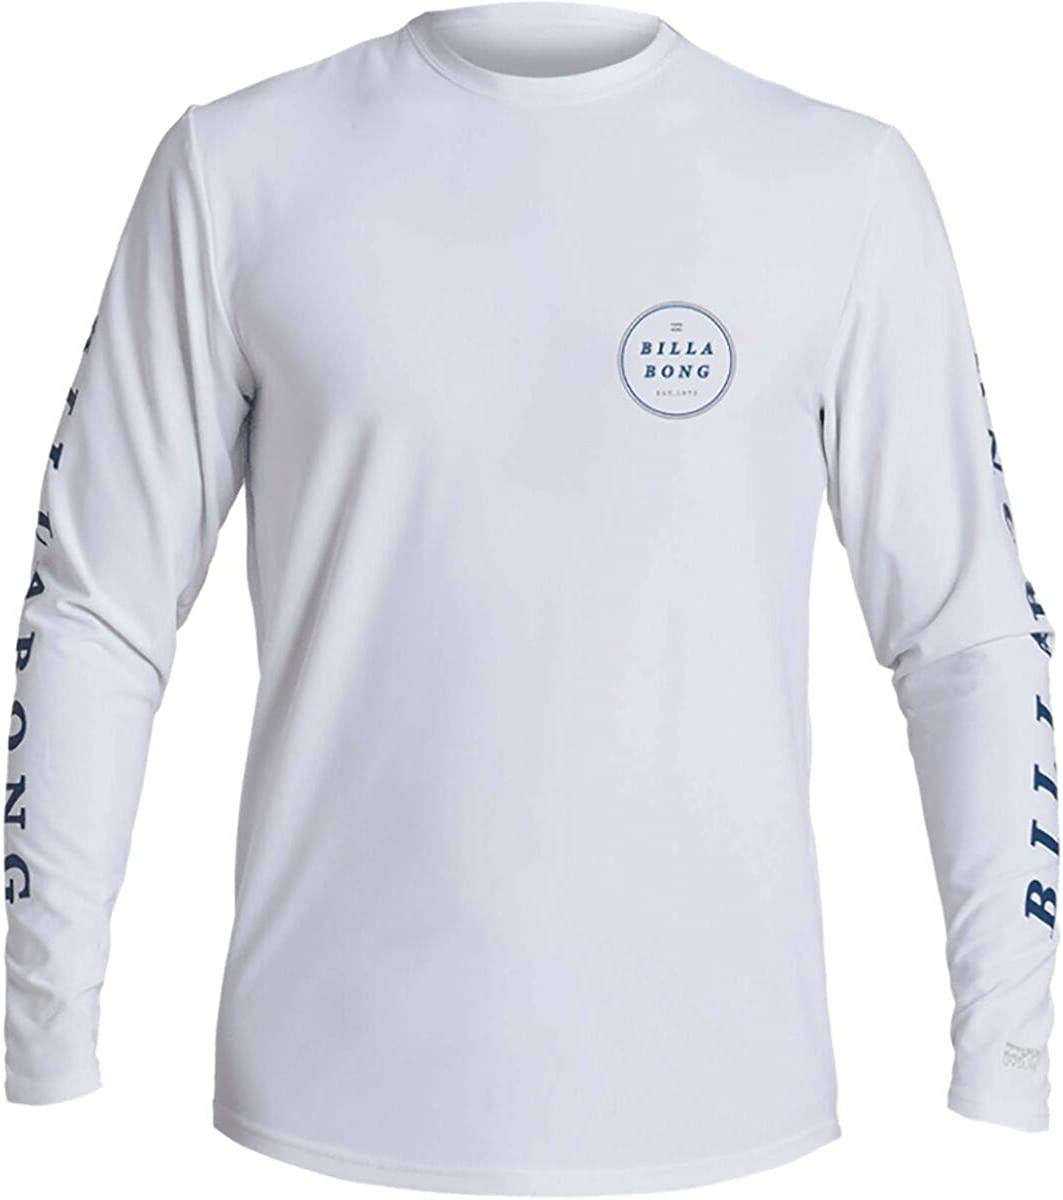 Billabong Classic Loose Fit Long Sleeve Rashguard Surf Tee Shirt